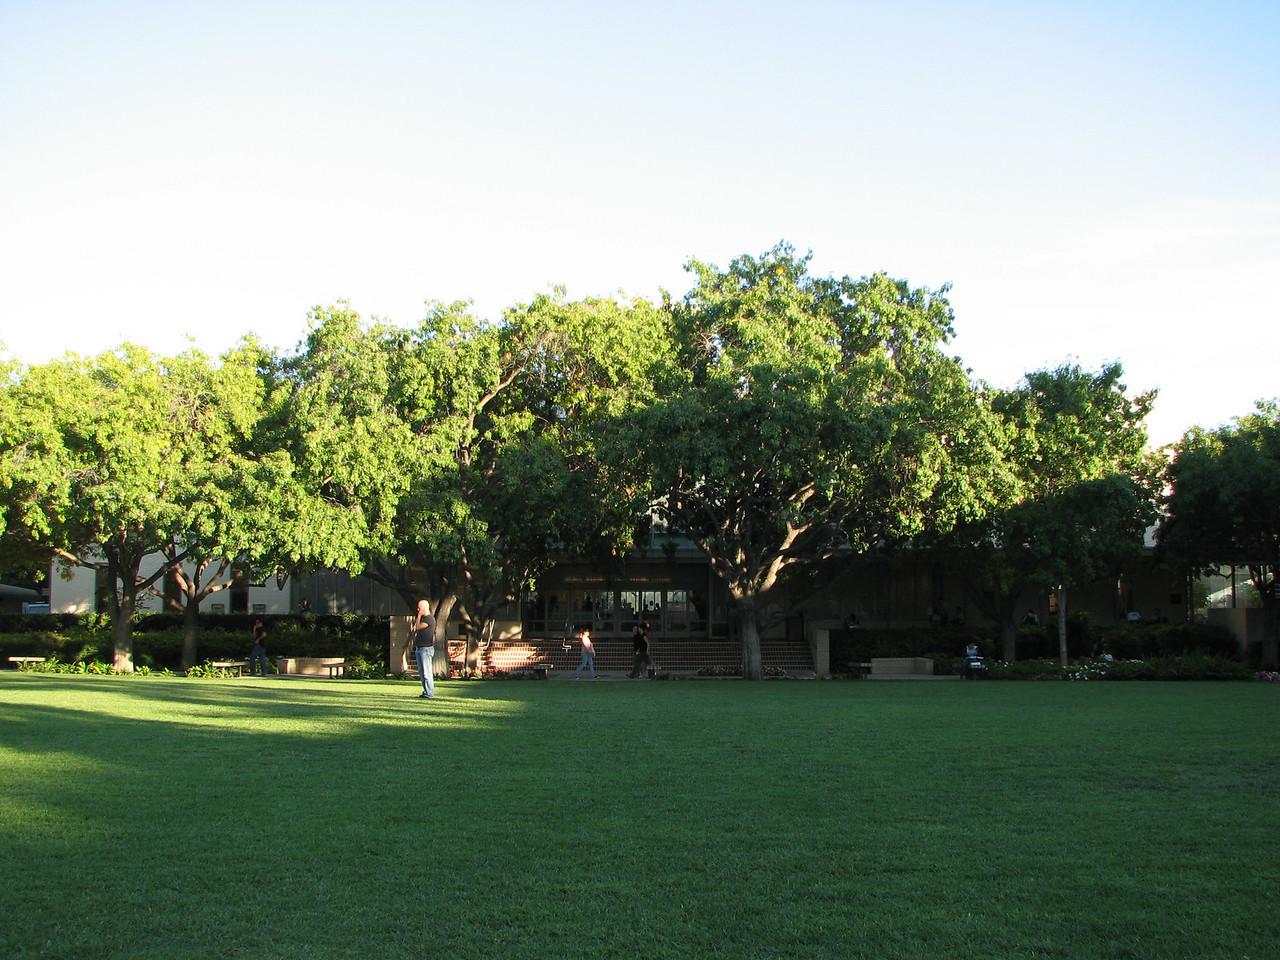 2006 09 27 Wed - Biola University Library is somewhere behind those trees 1